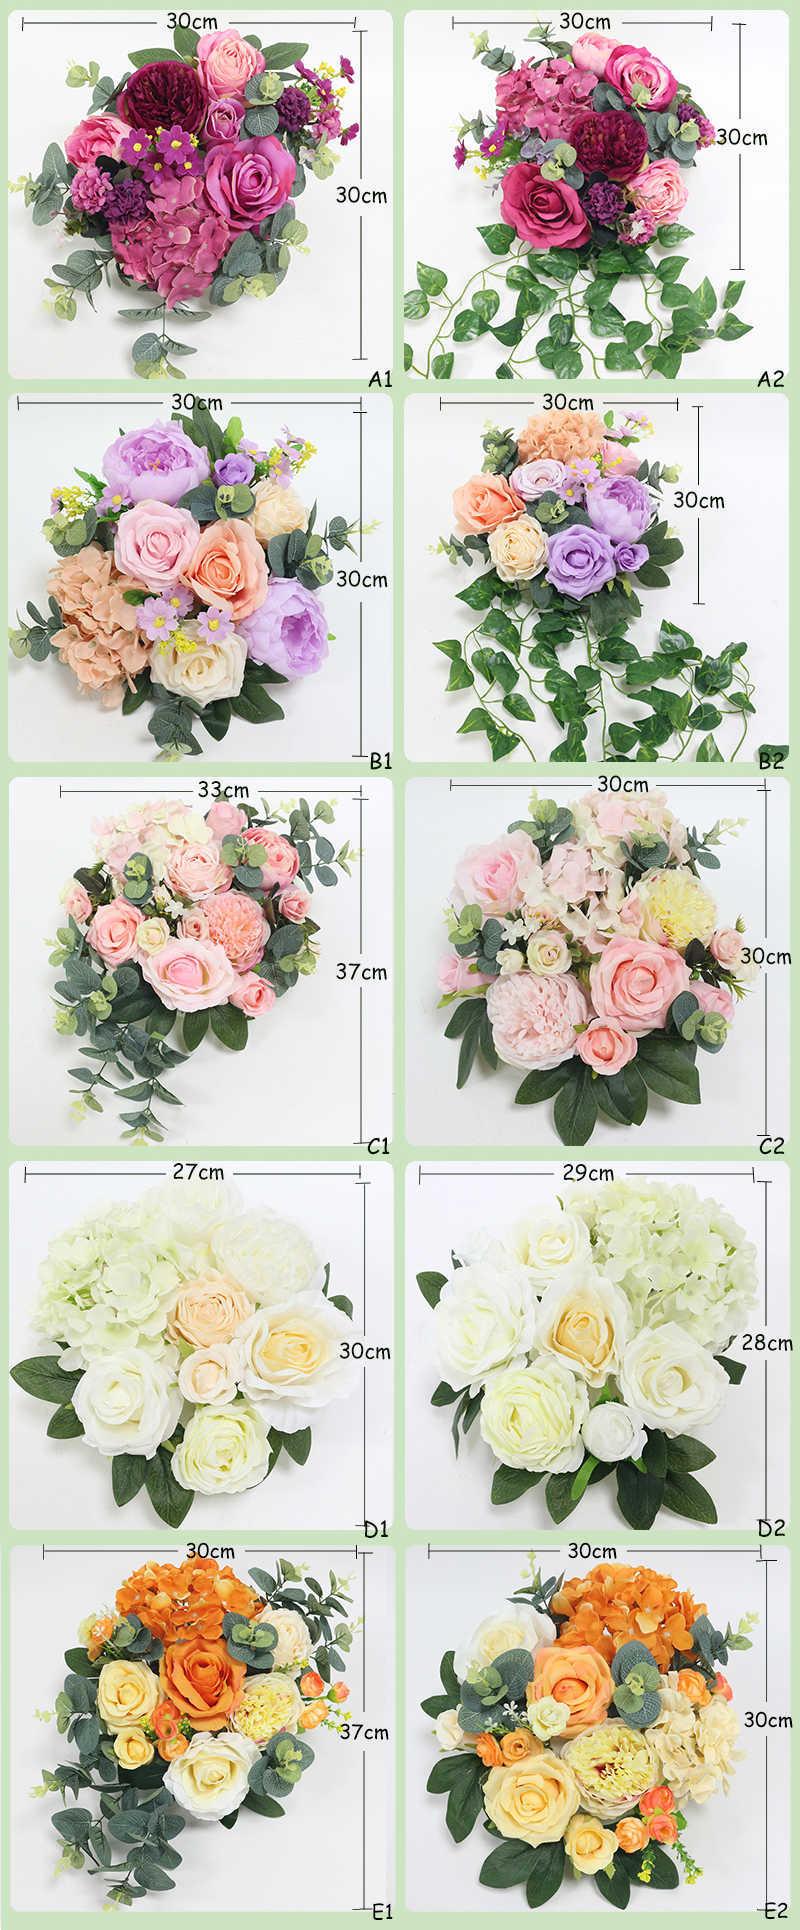 JAROWN Artificial Rose Flower Row Small Corner Flowers Simulation Silk Fake Flowers Wedding Decor Home Garland Decor Flores (218)